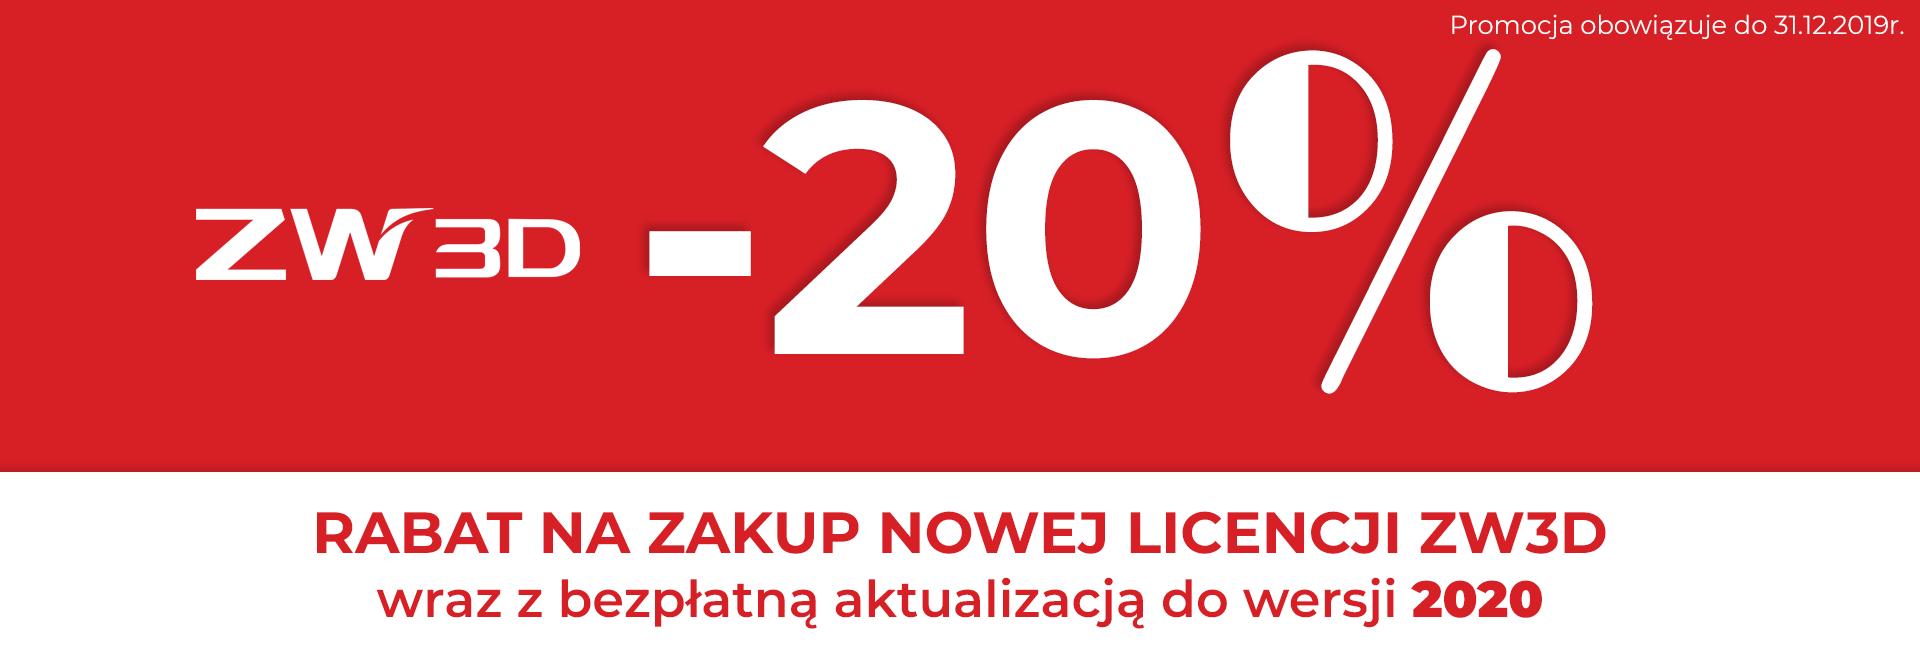 program do cad cam - zw3d promocja - 20%